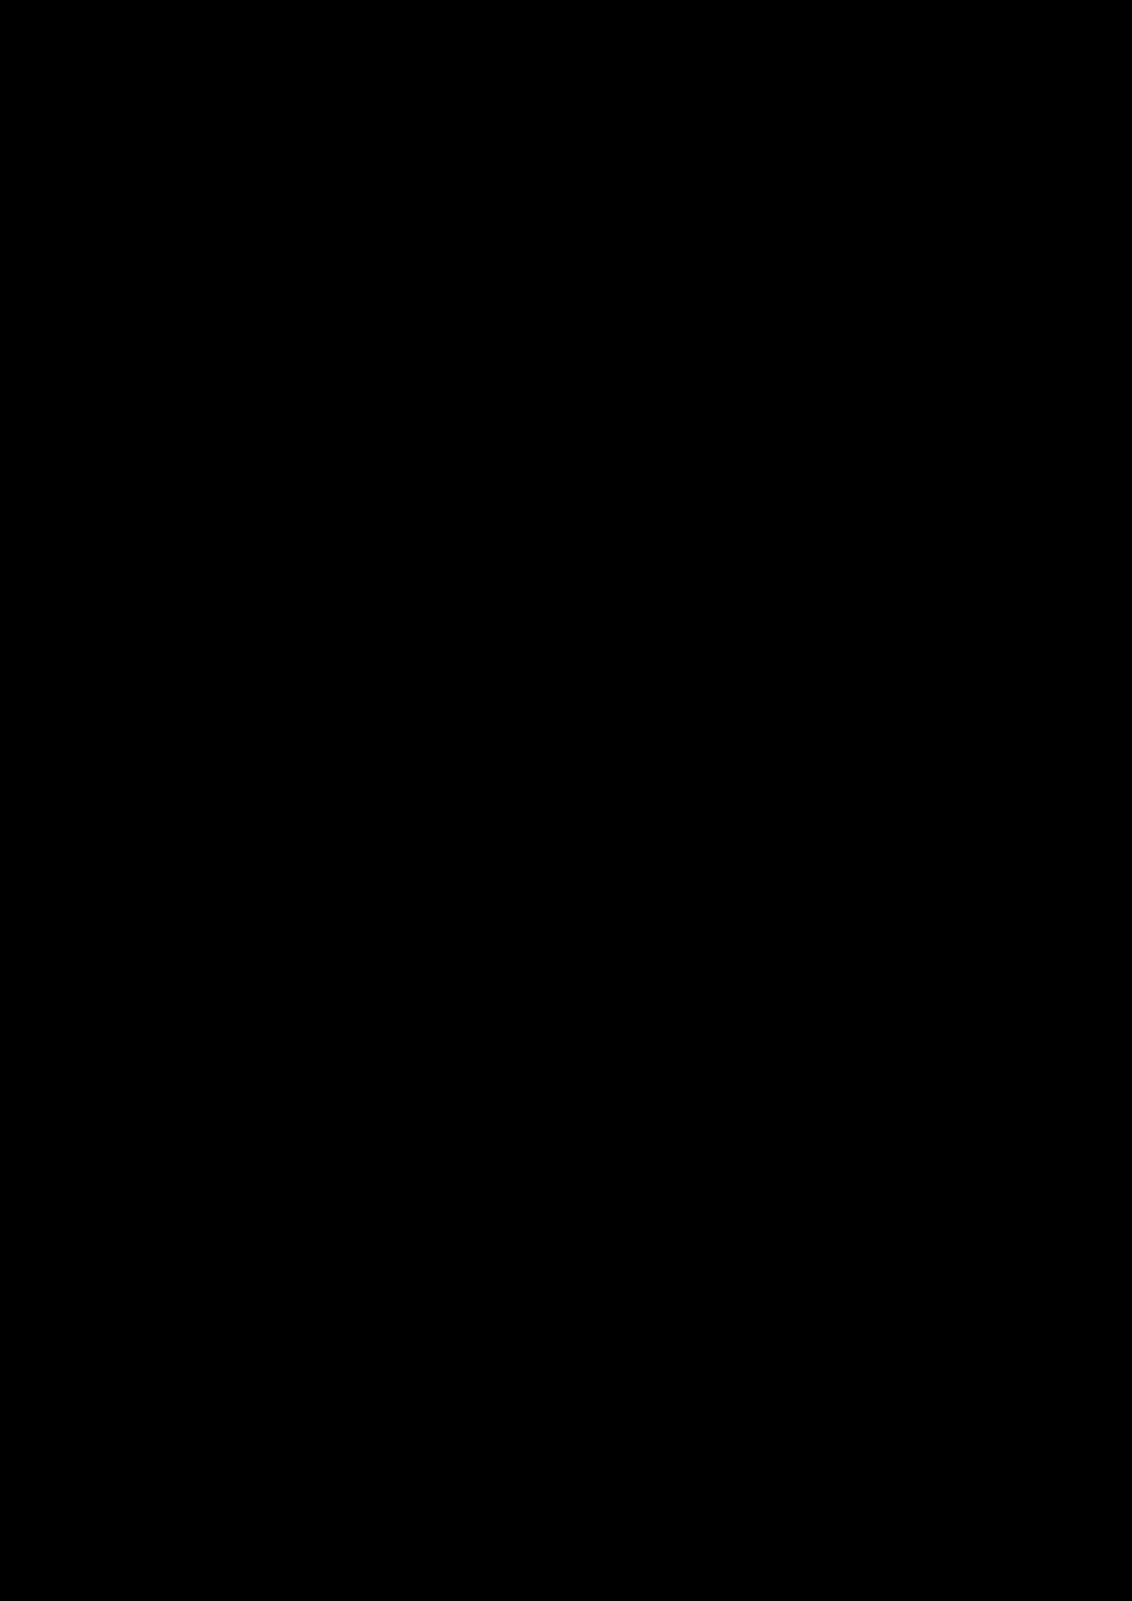 Belyiy sokol slide, Image 150